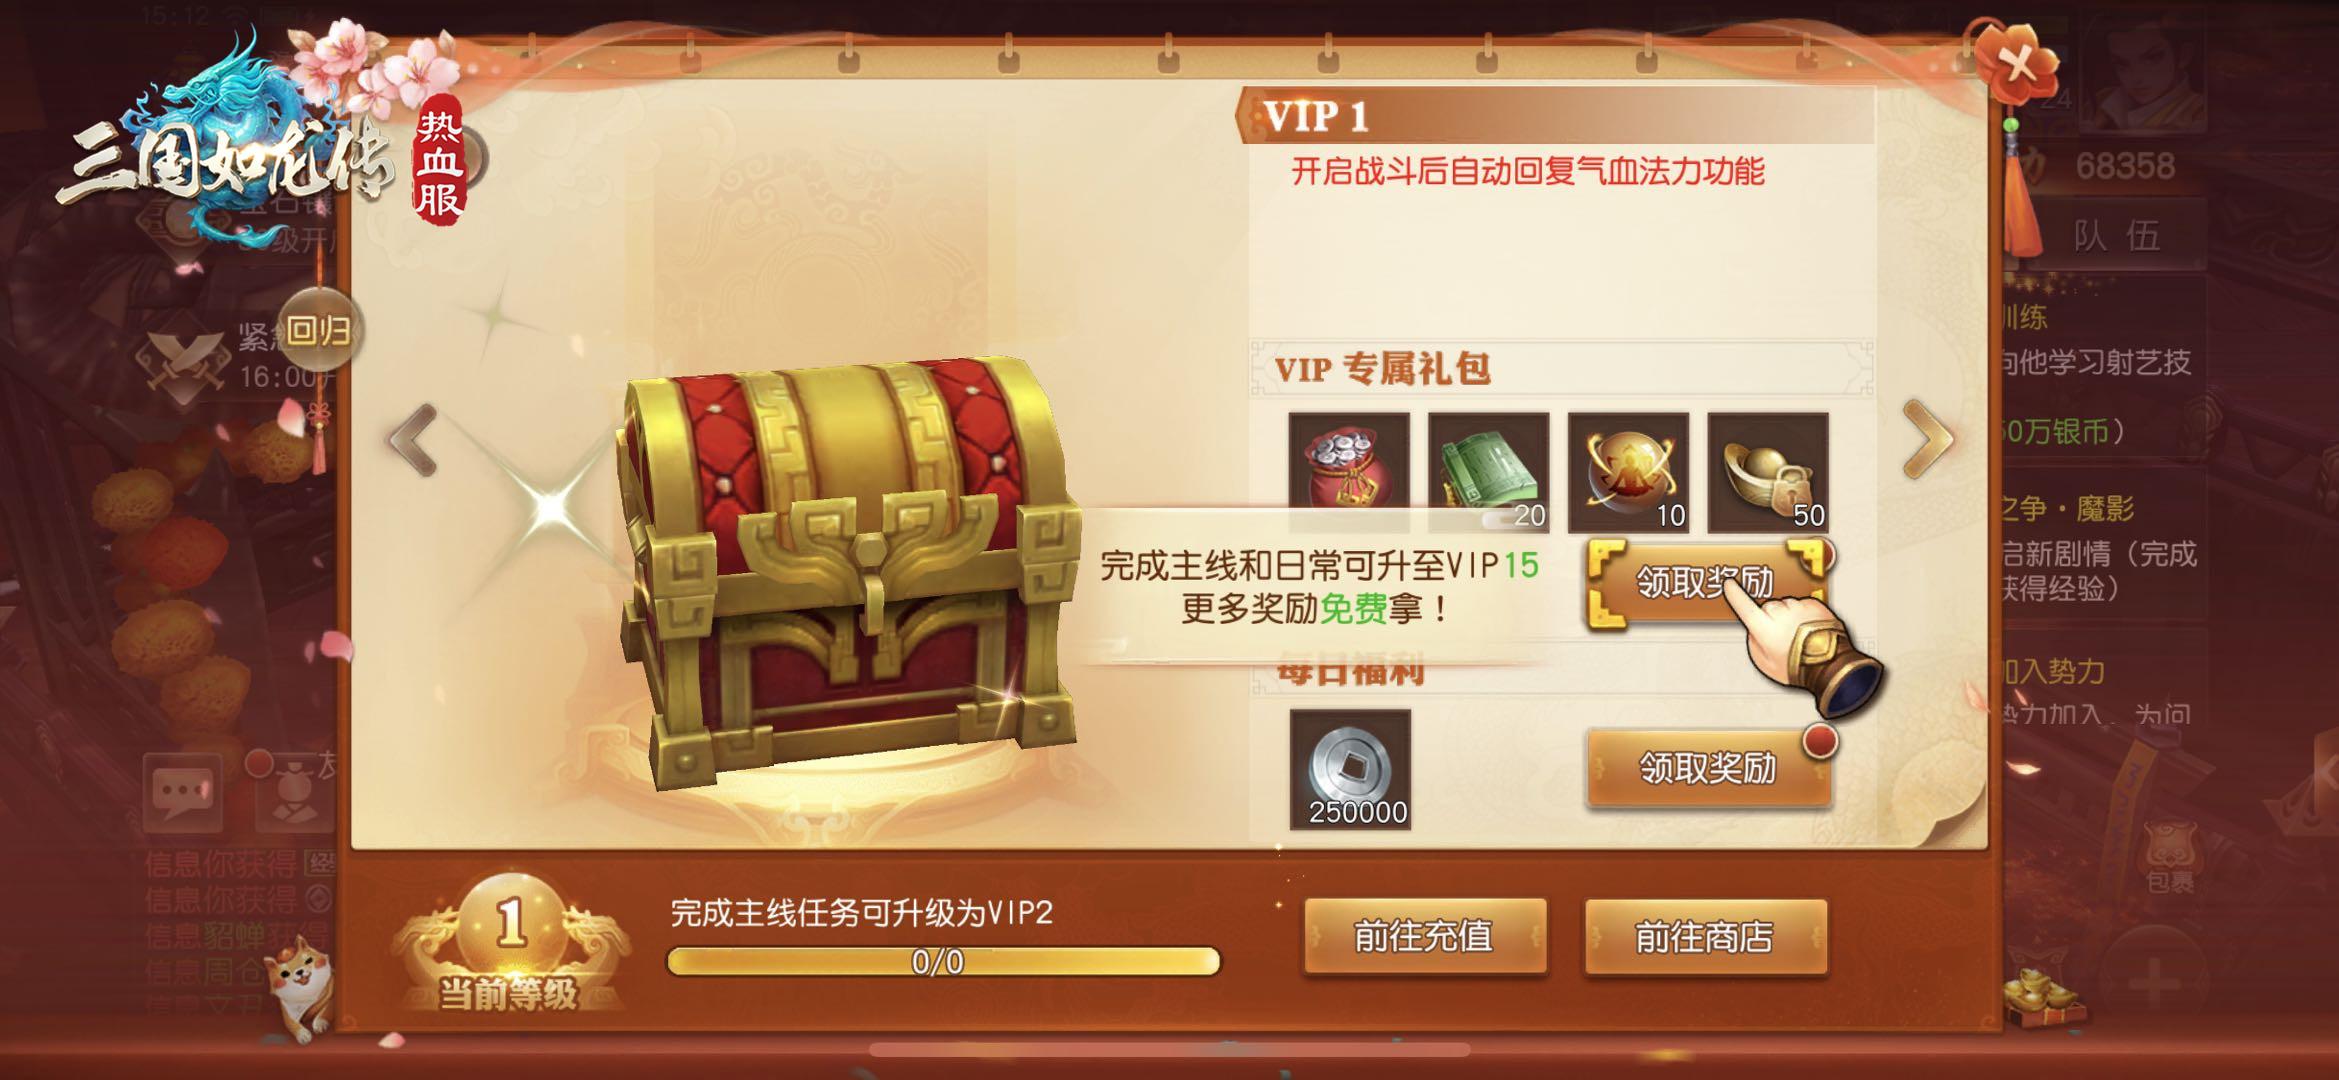 http://www.jdpiano.cn/youxi/181359.html